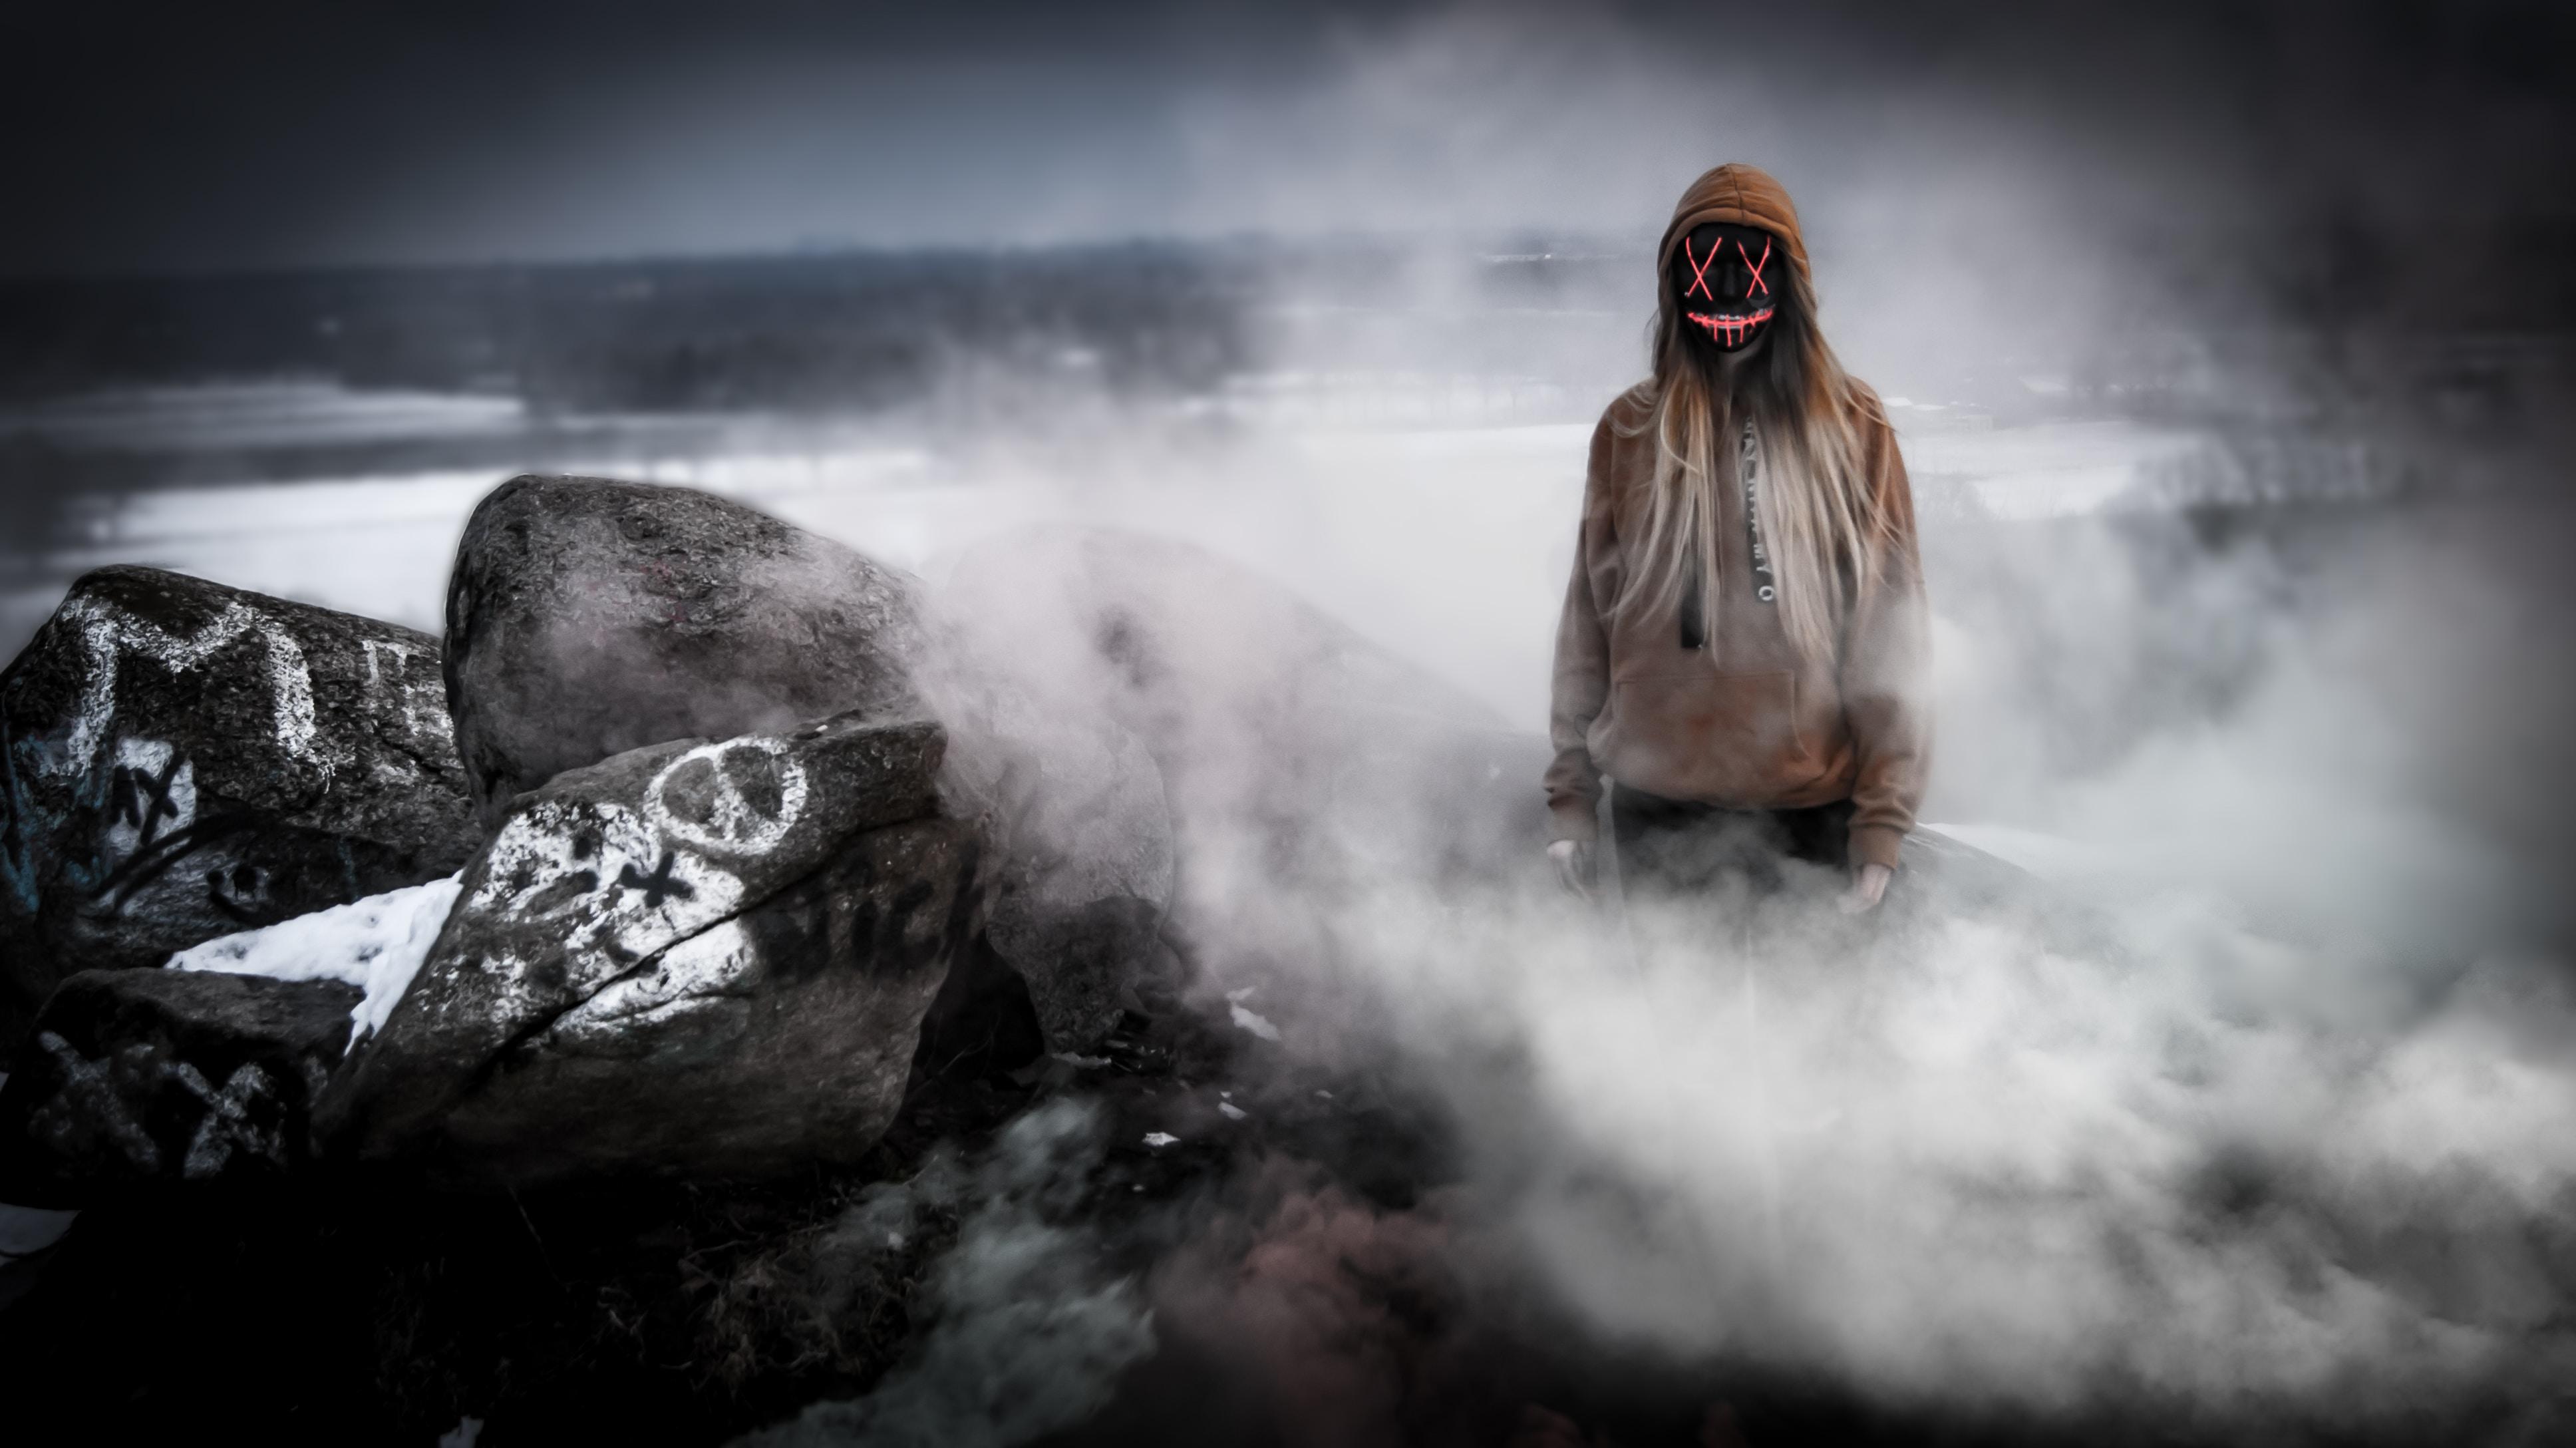 horror girl mask smoke 4k 1616092567 - Horror Girl Mask Smoke 4k - Horror Girl Mask Smoke 4k wallpapers